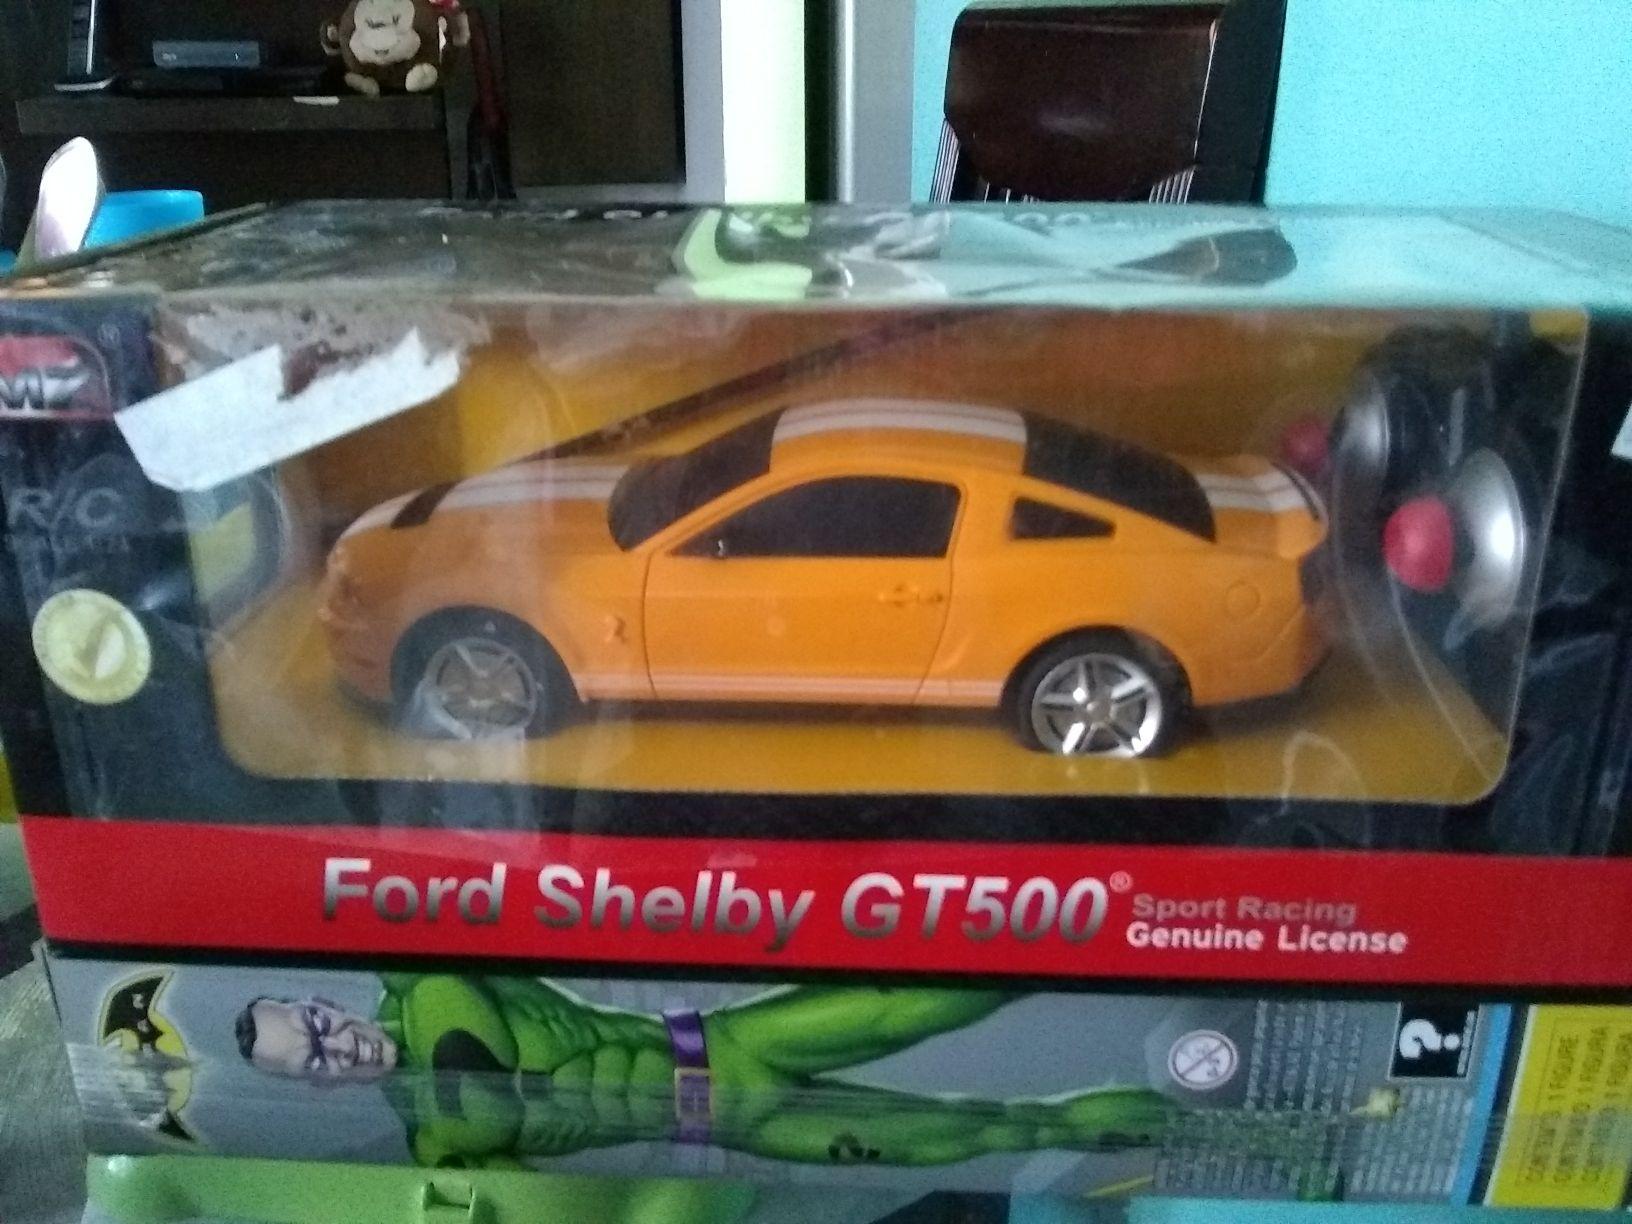 Chedraui H.Tecámac: FORD SHELBY GT 500 R/C GENUINE LICENSE